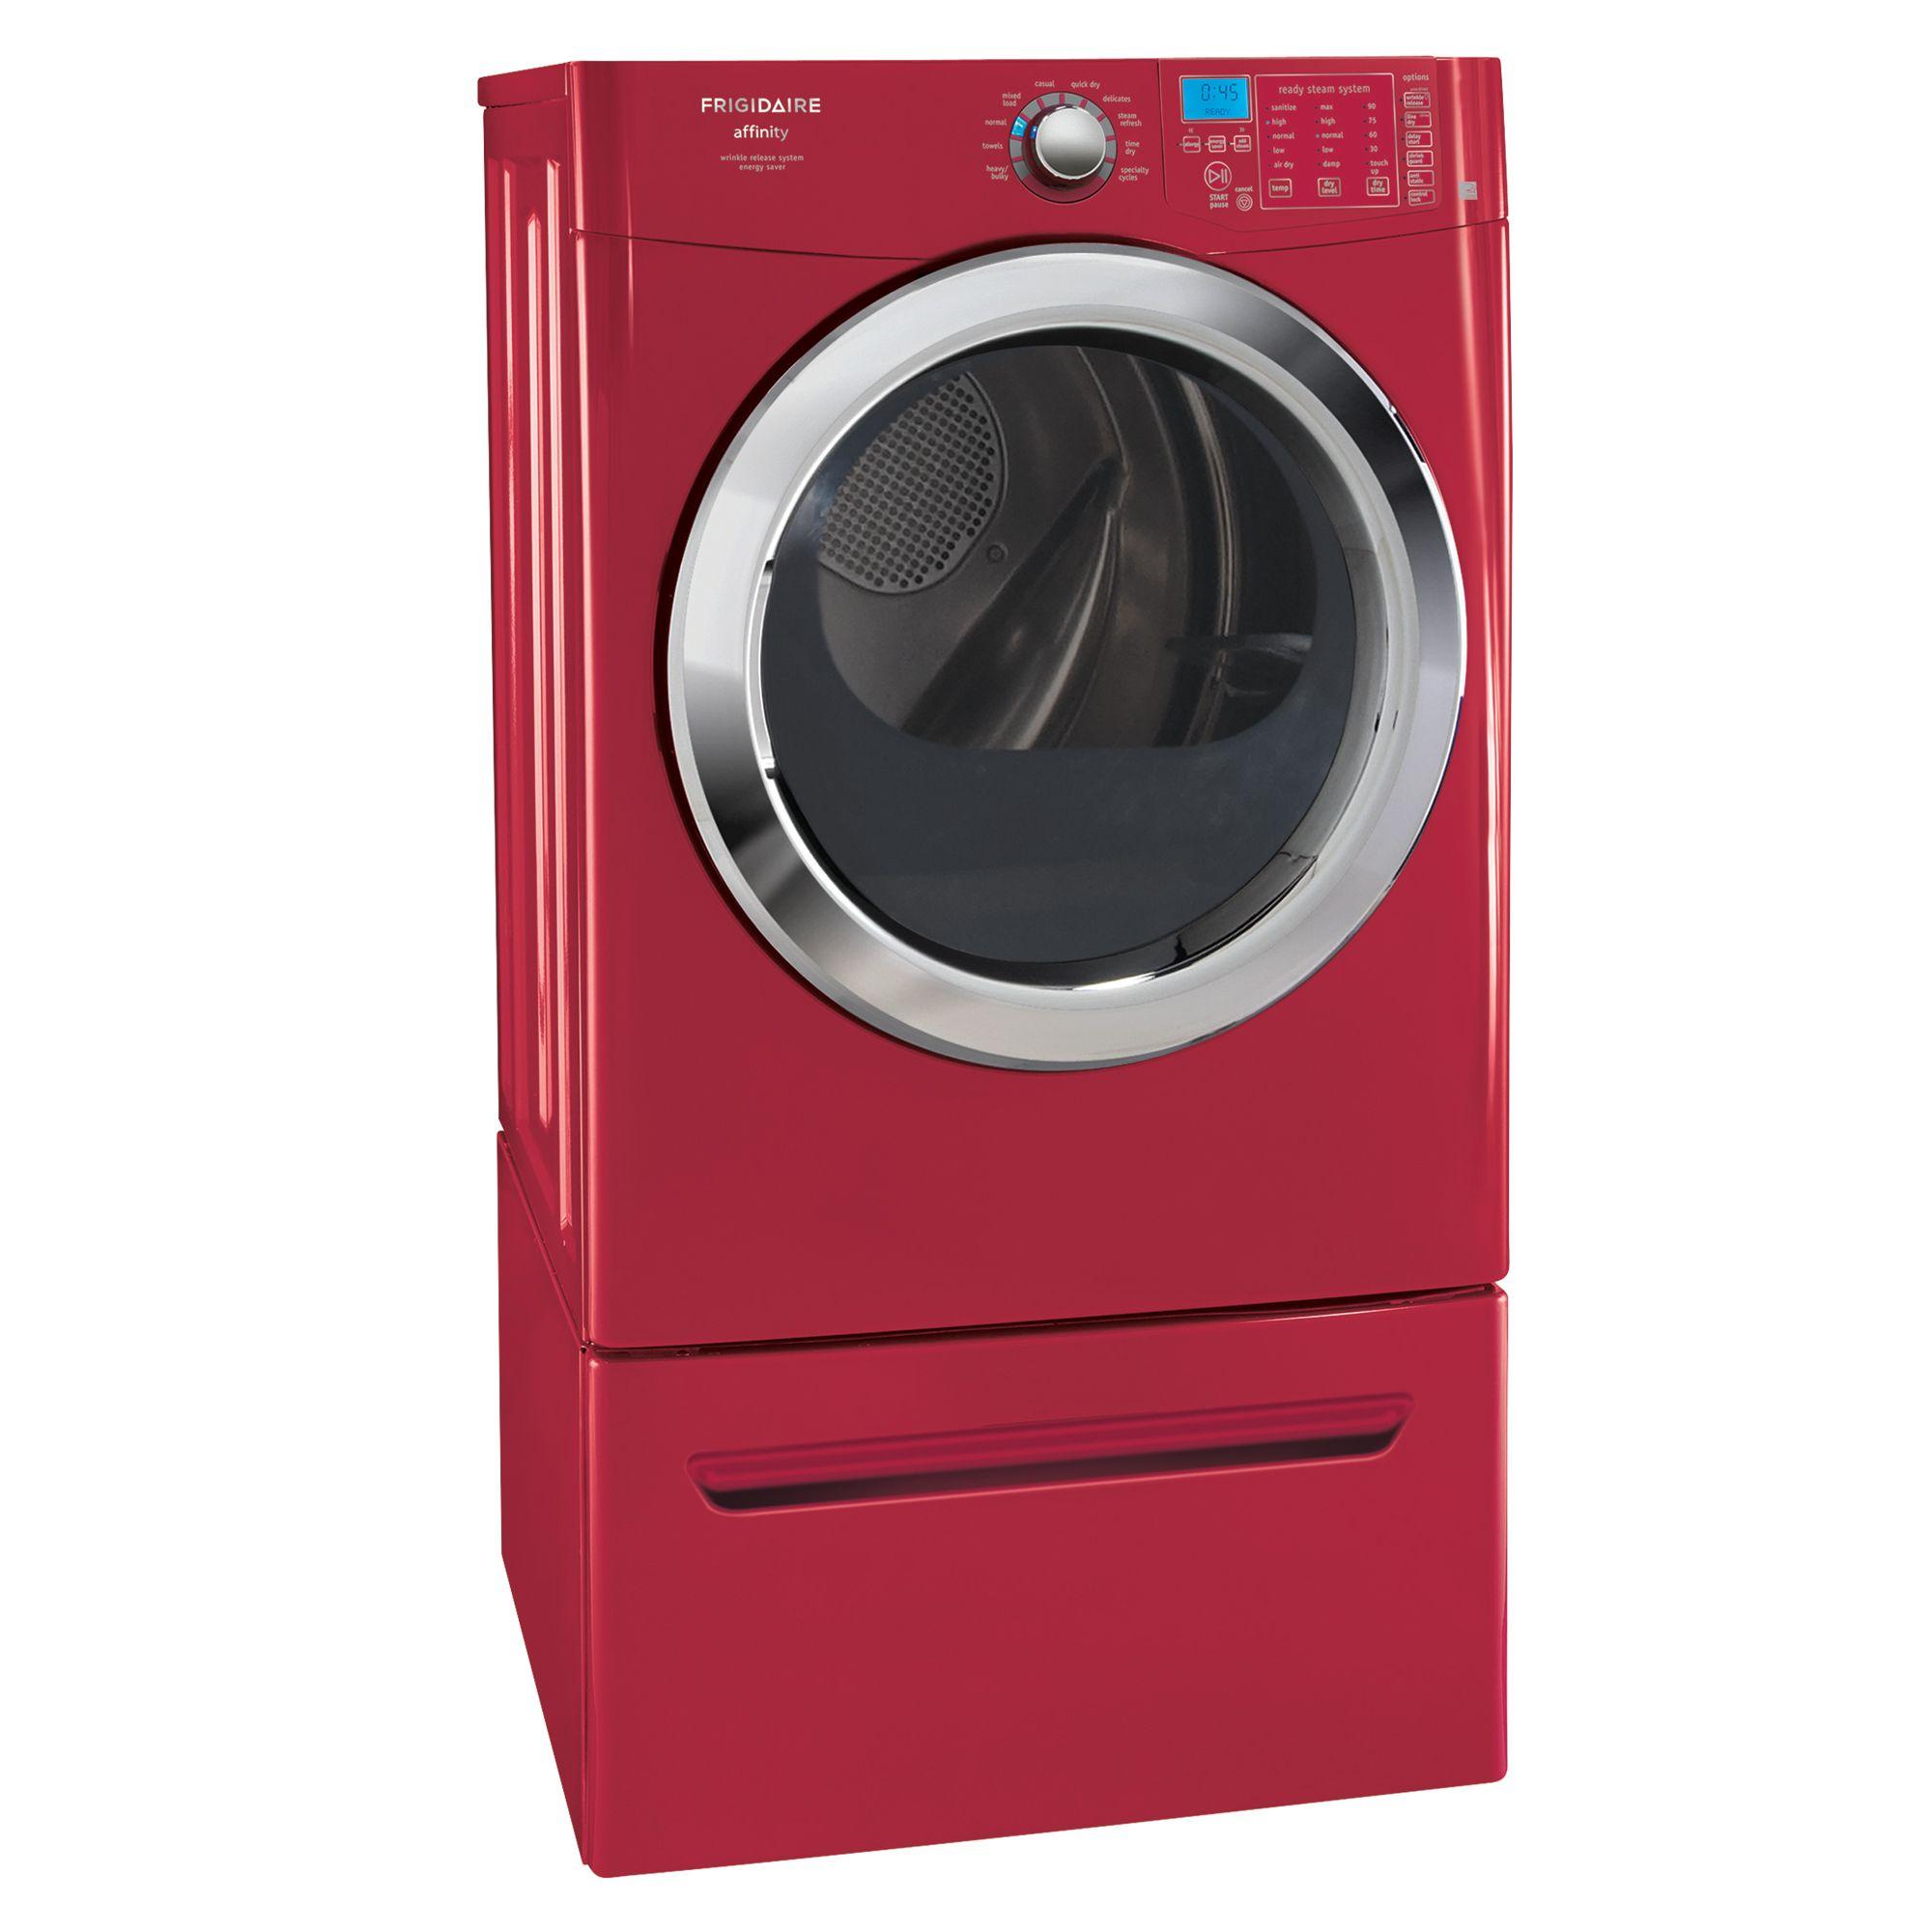 Frigidaire Affinity 7.0 cu. ft. Gas Steam Dryer (FASG7074)